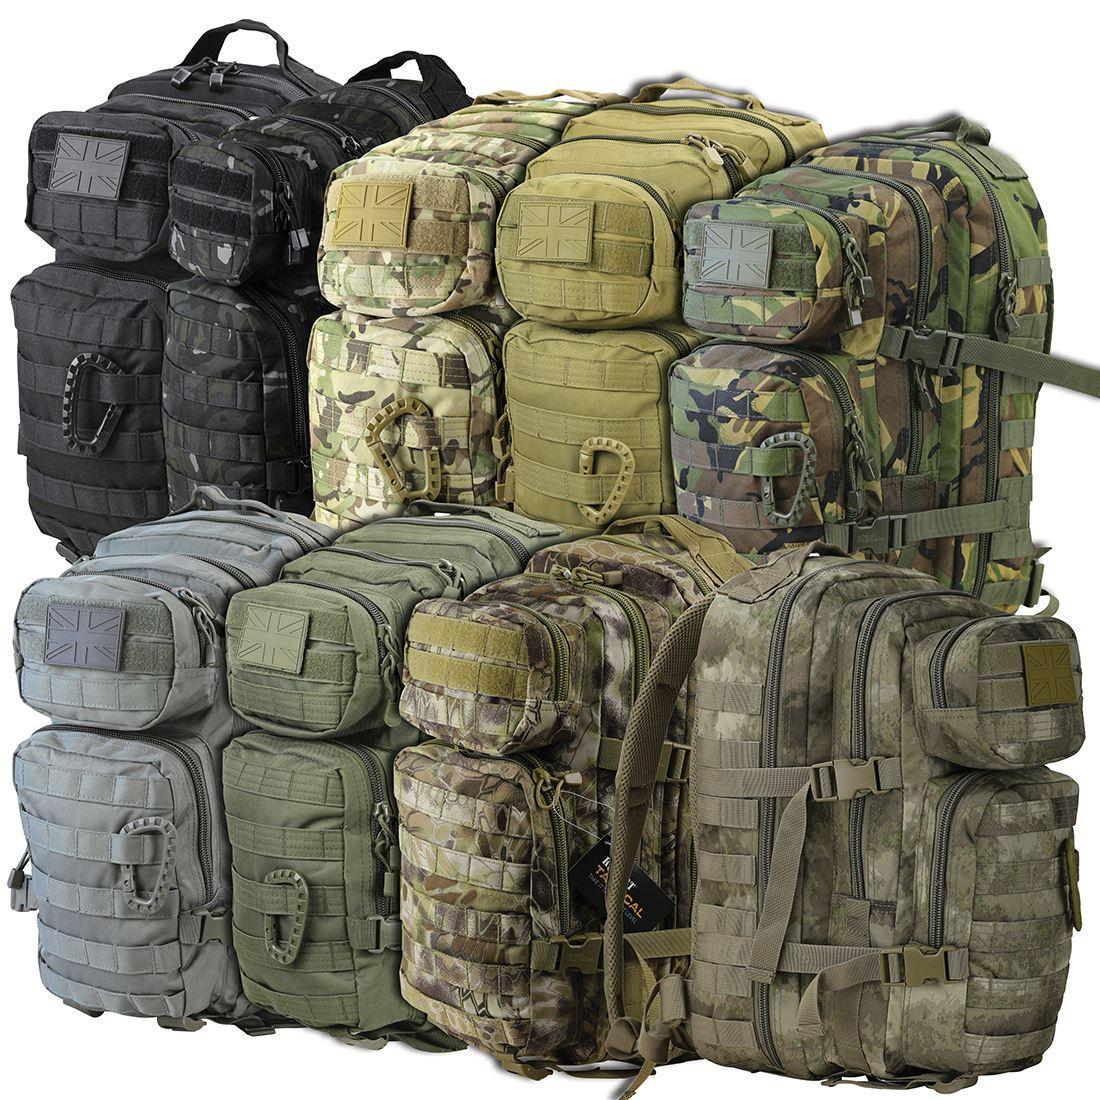 28 Litre MOLLE DAYSACK OLIVE GREEN ARMY STYLE  Assault  Pack RUCKSACK CADET